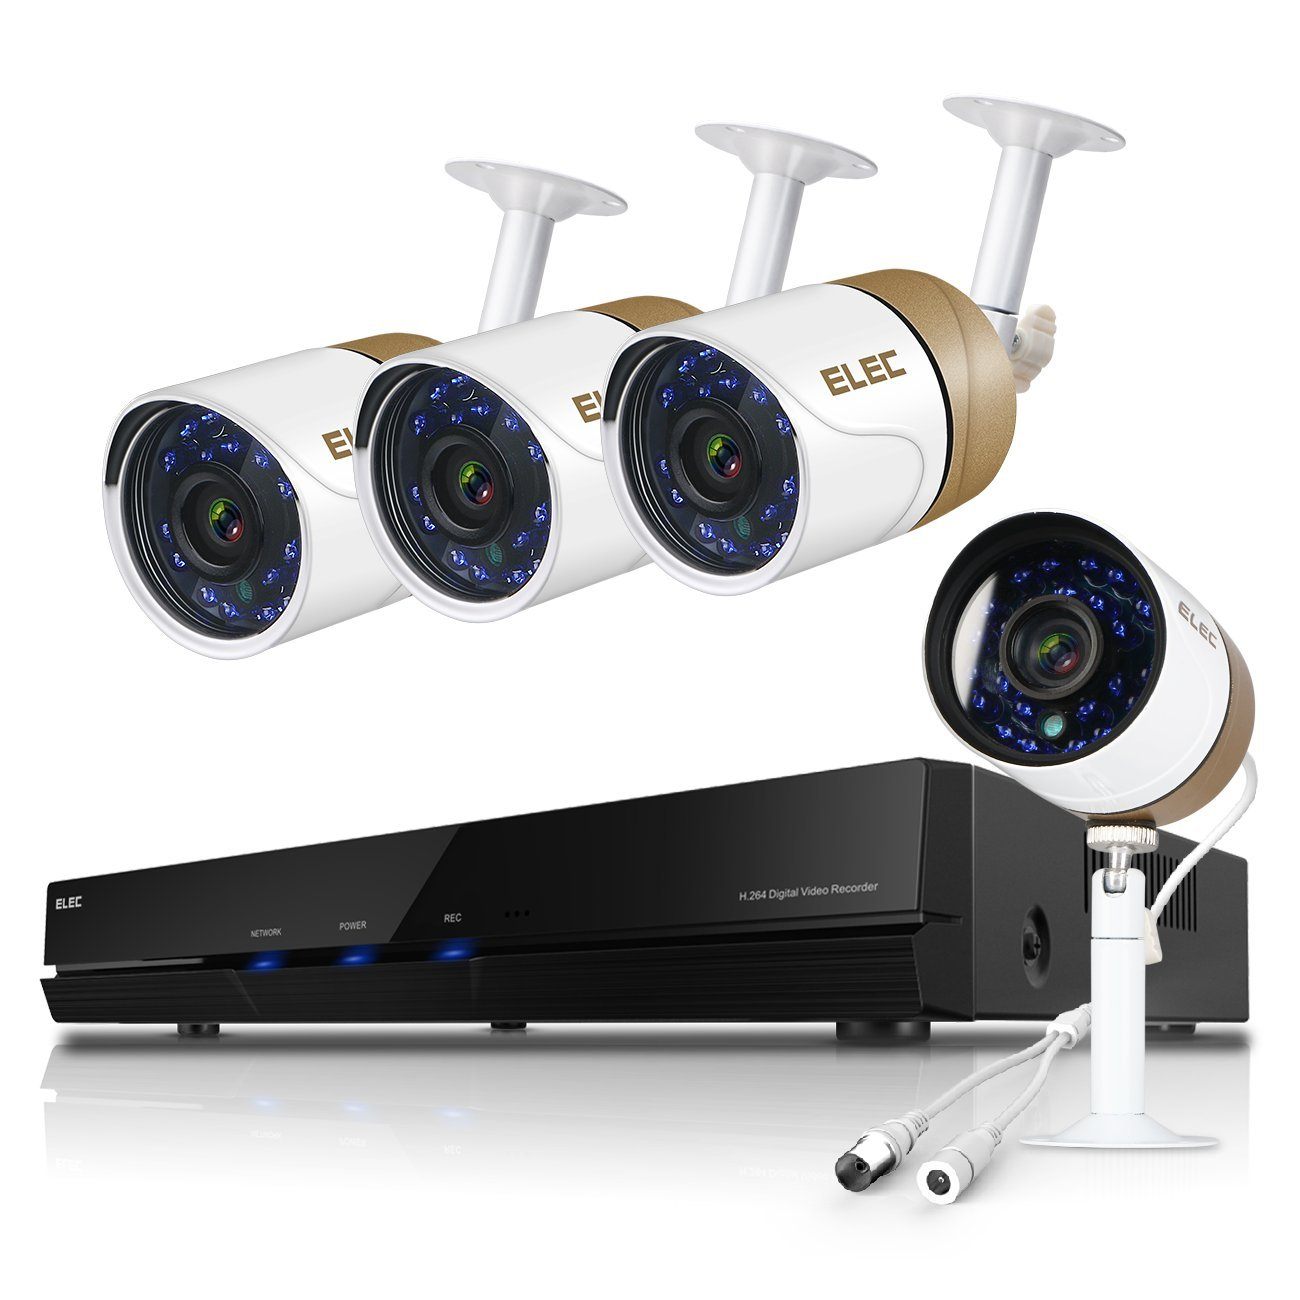 ELEC 8-Channel 1080N CCTV Security Camera System,720P AHD DVR Recorder with (4) 2000TVL Indoor/Outdoor Weatherproof Surveillance Cameras,No Hard Drive